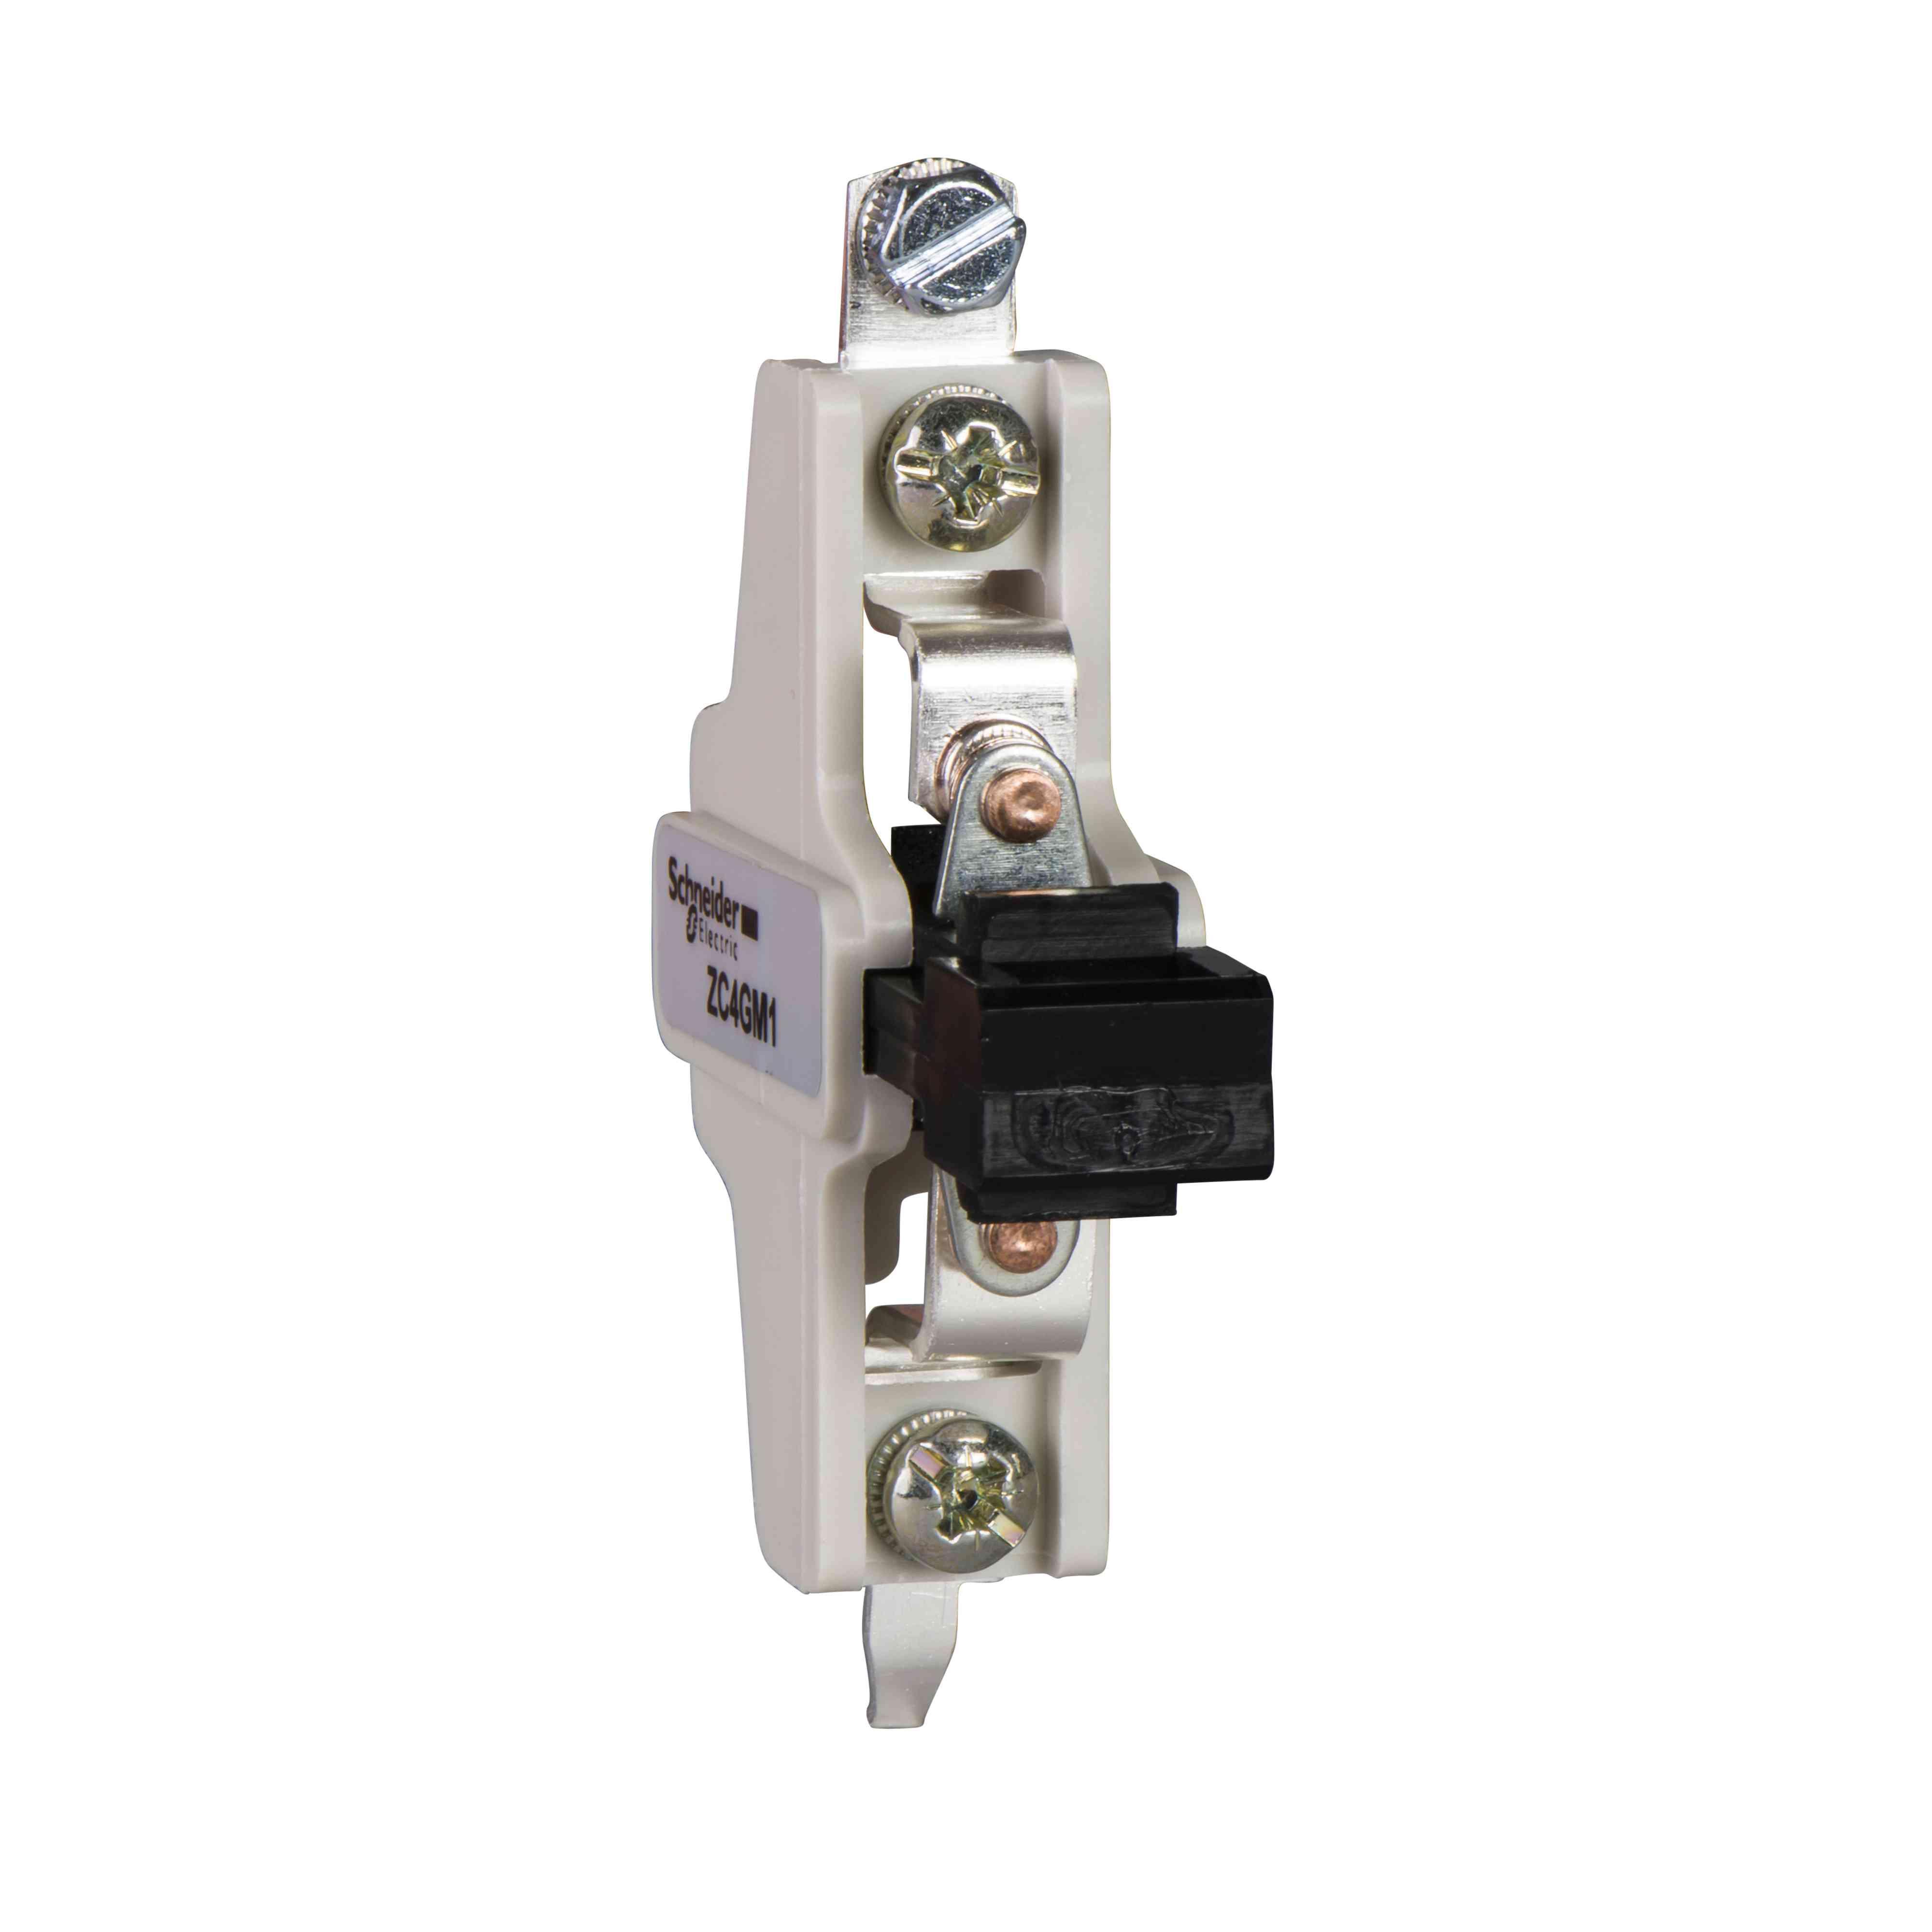 Kontaktni blok - 2 NO - standardni - vijak za omejitveno stikalo